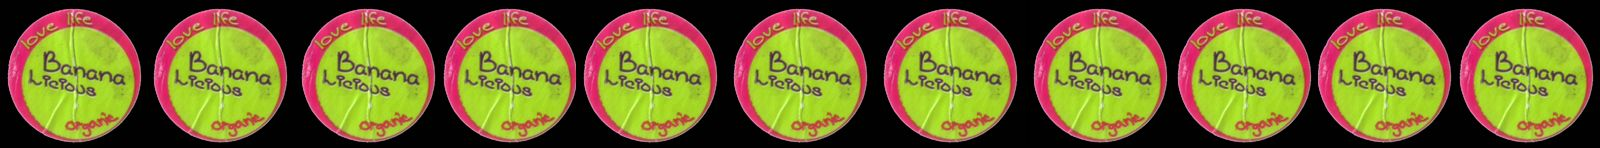 Etiquette_Banana_Licious_Organic